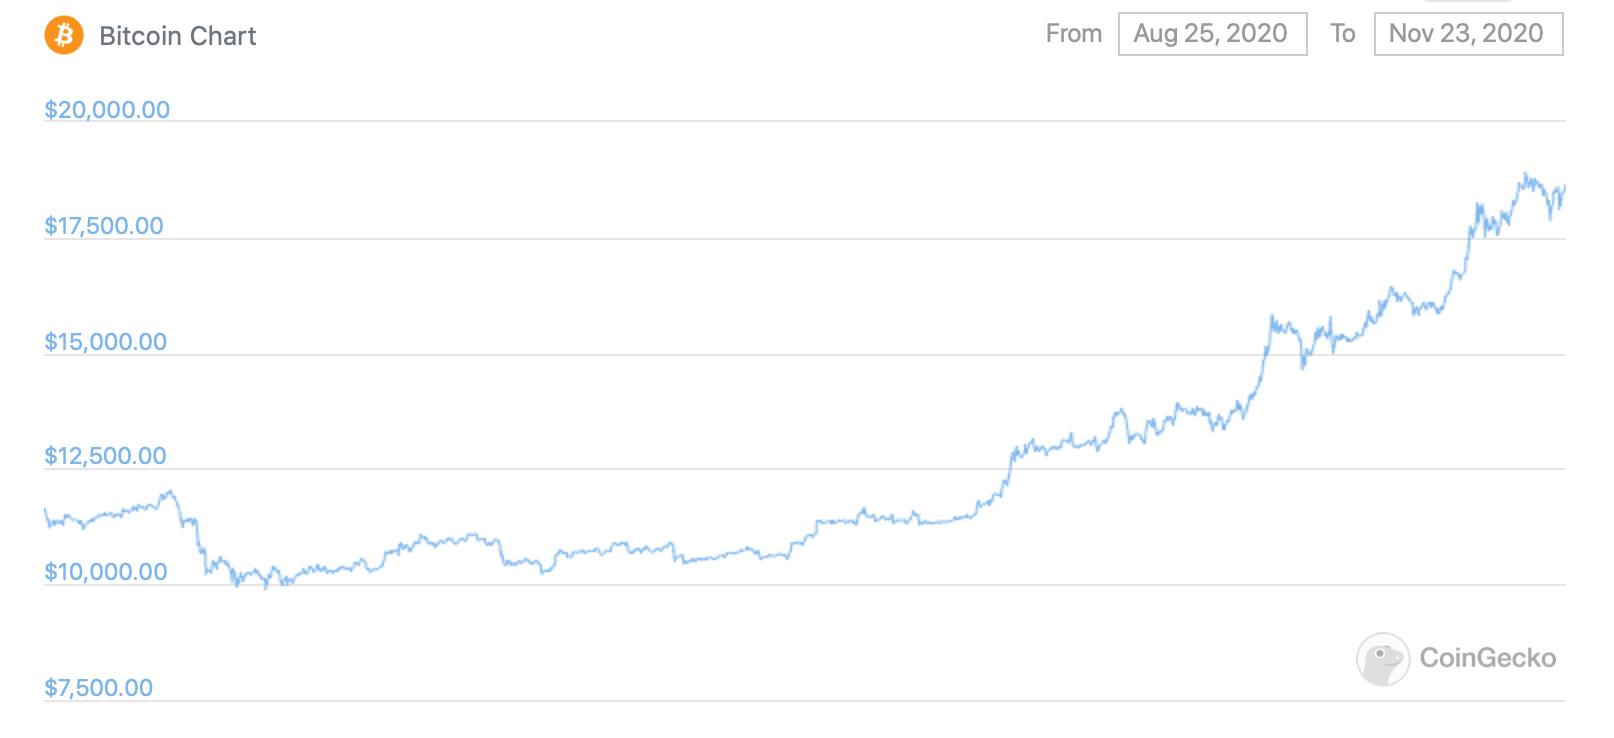 График курса Биткоина за последние три месяца